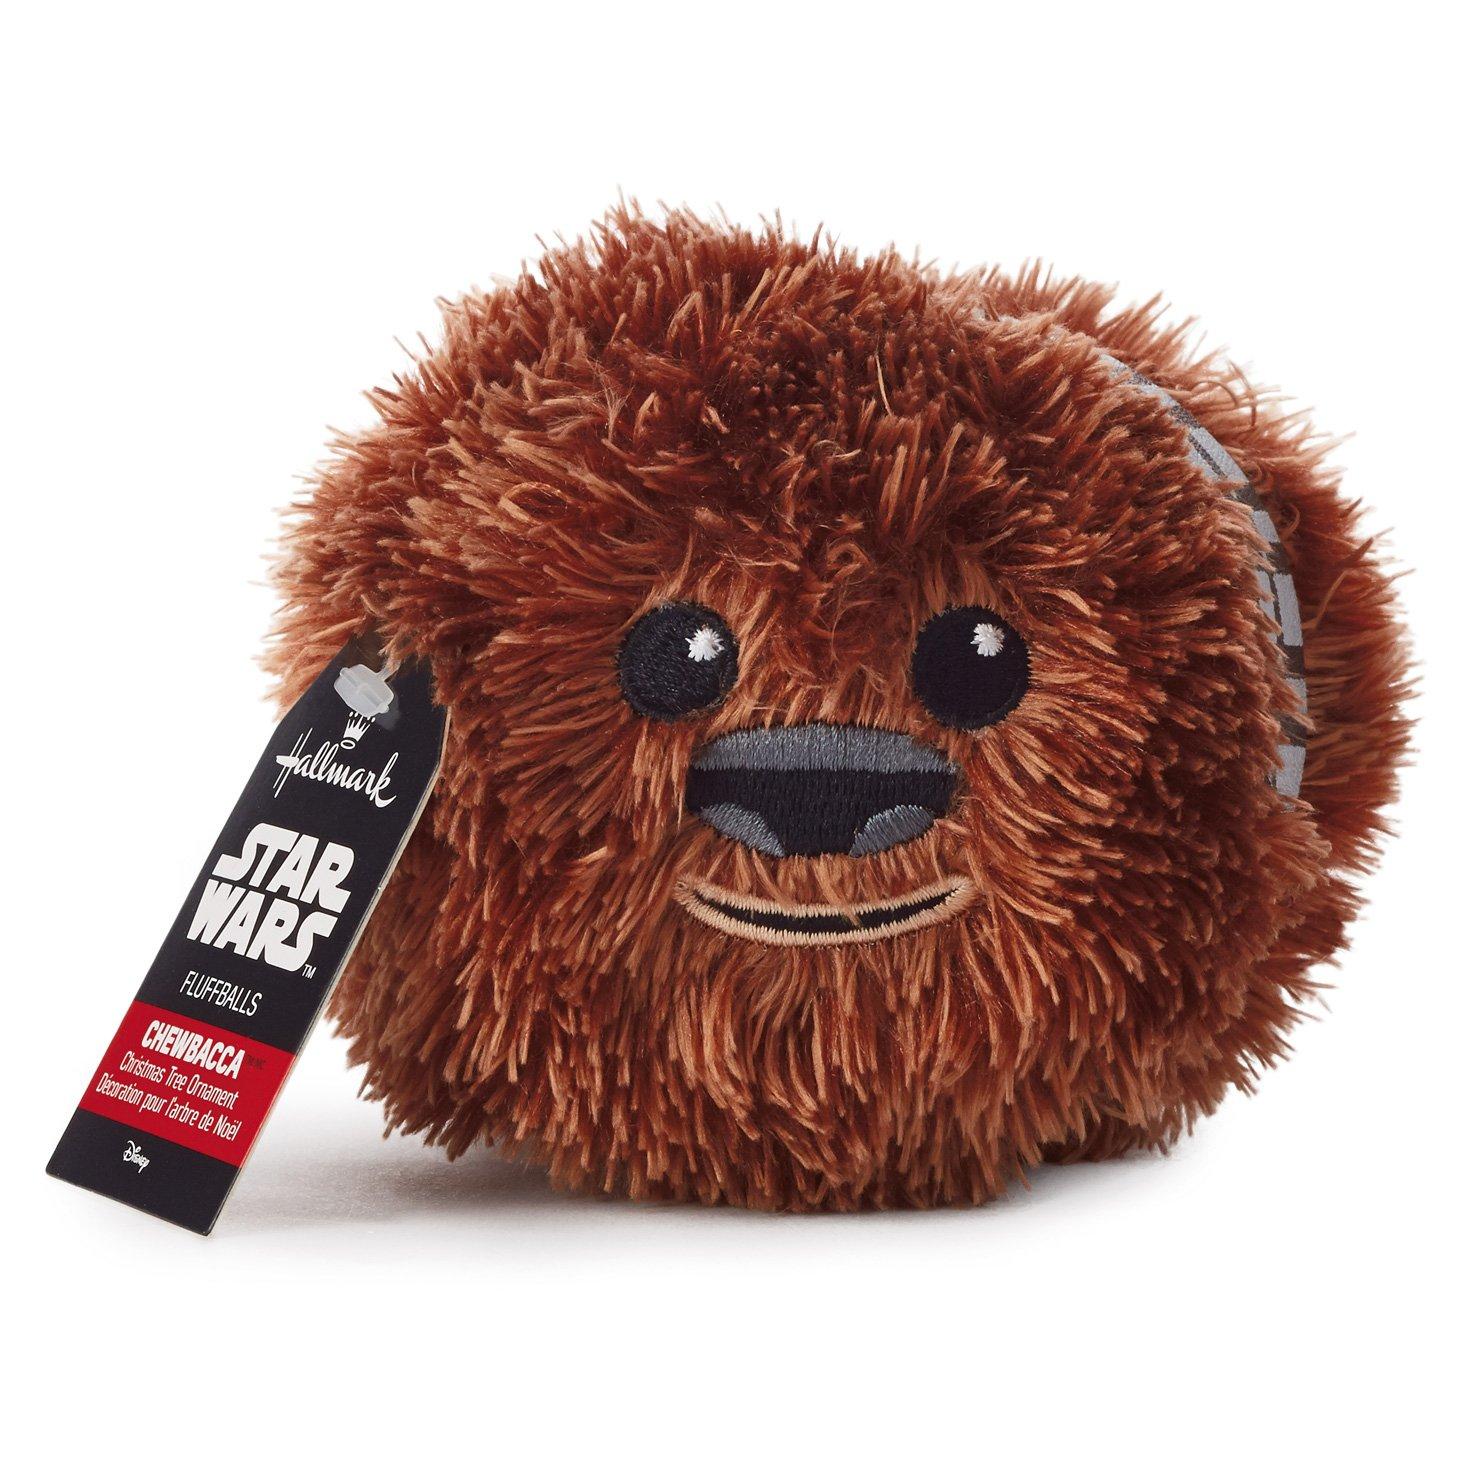 Amazon.com: Hallmark Star Wars Chewbacca Fluff Ball Ornament: Home ...